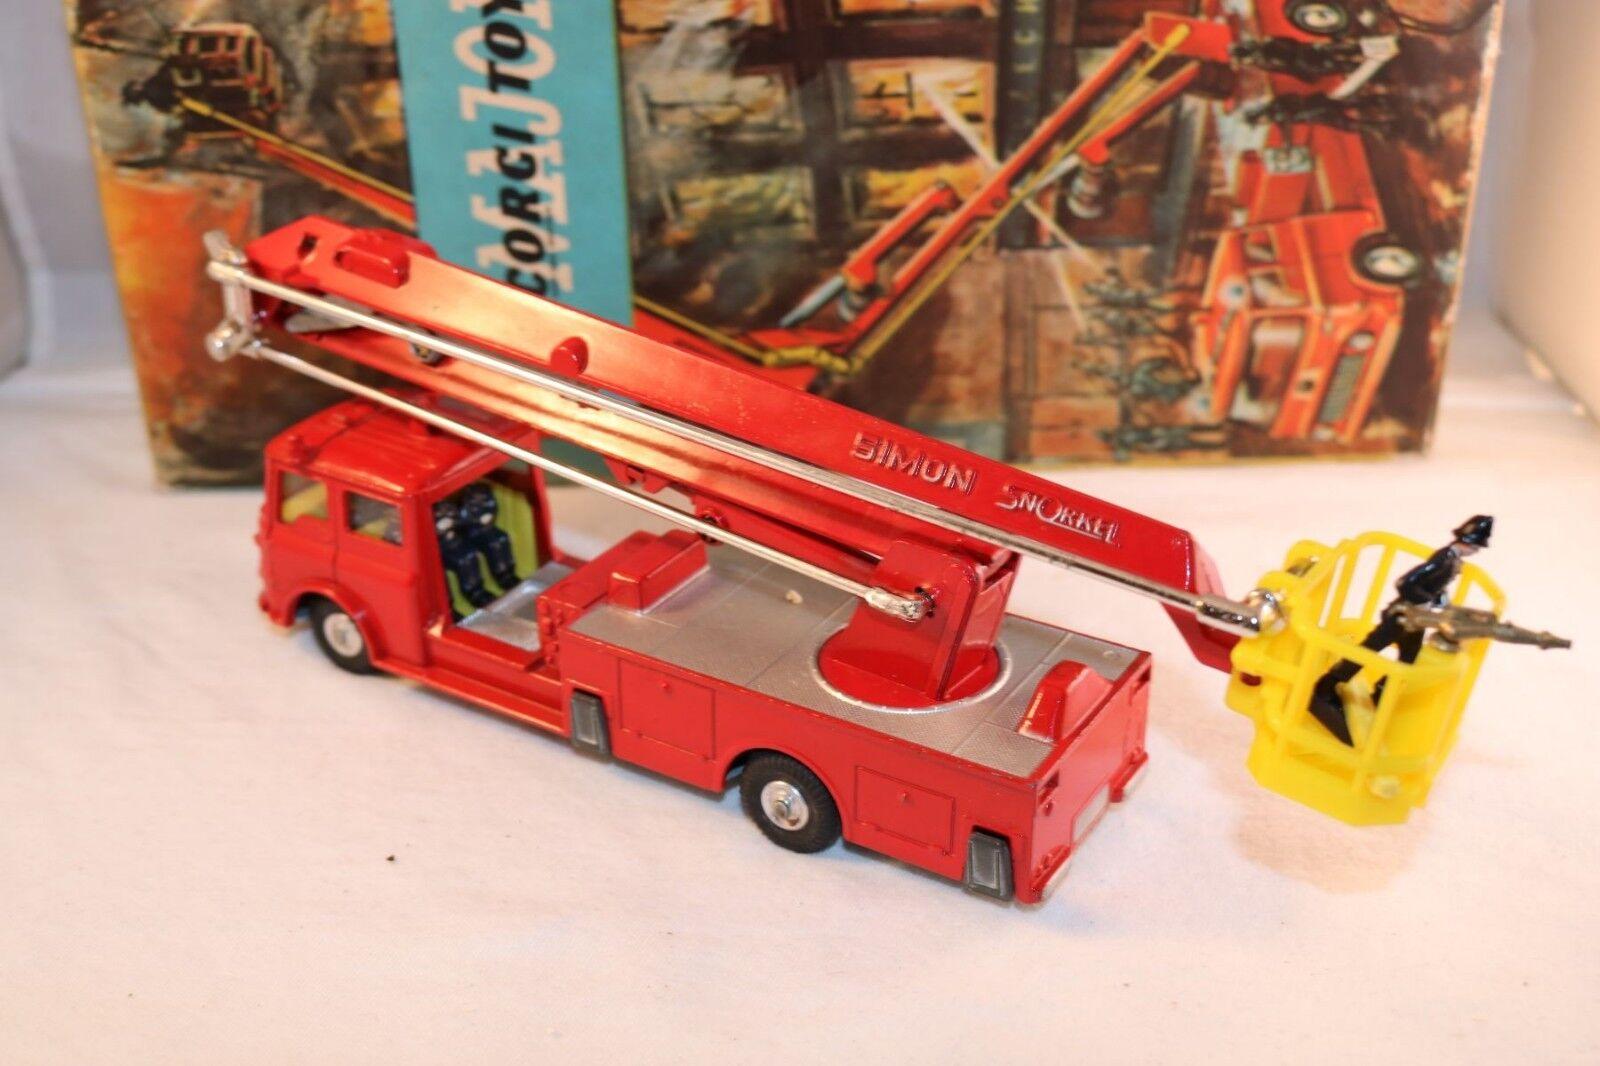 Corgi Toys 1127 Simon Snorkel Fire Engine very near mint mint mint in box with leaflat afec37